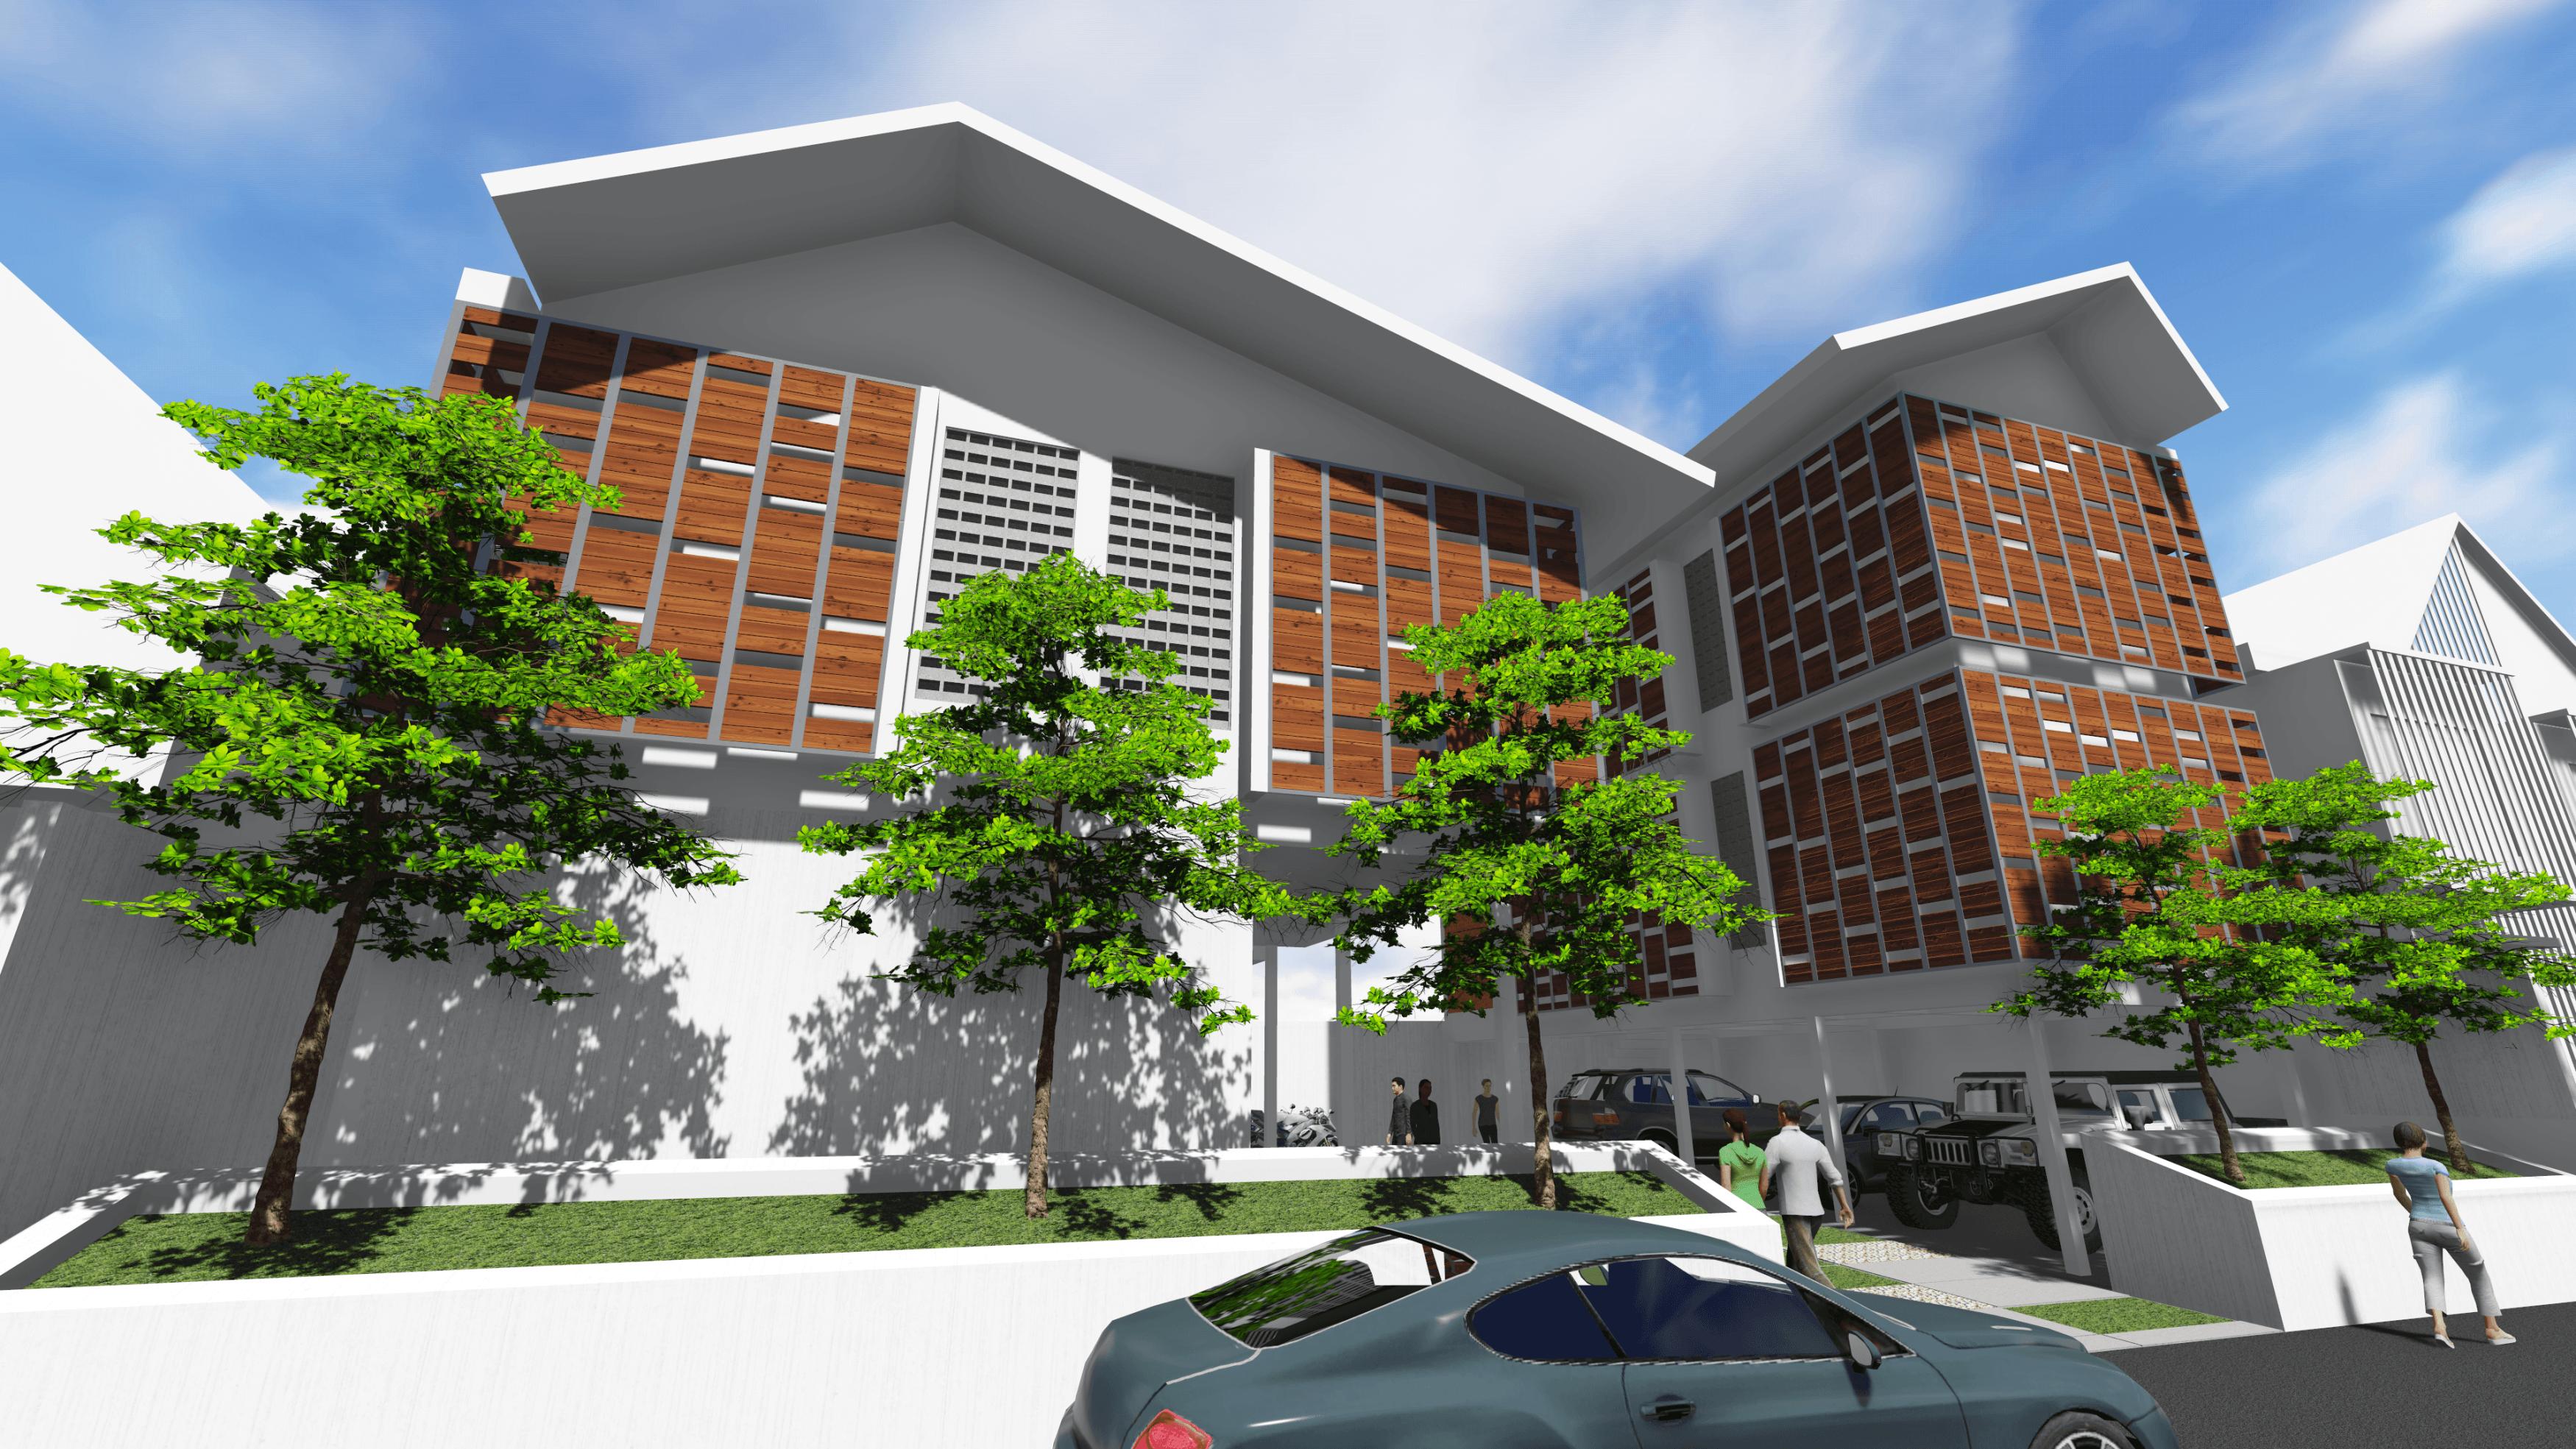 Arah Studio Simongan  Mini Apartment Semarang, Kota Semarang, Jawa Tengah, Indonesia Semarang, Kota Semarang, Jawa Tengah, Indonesia Exterior 3 Kontemporer  31729